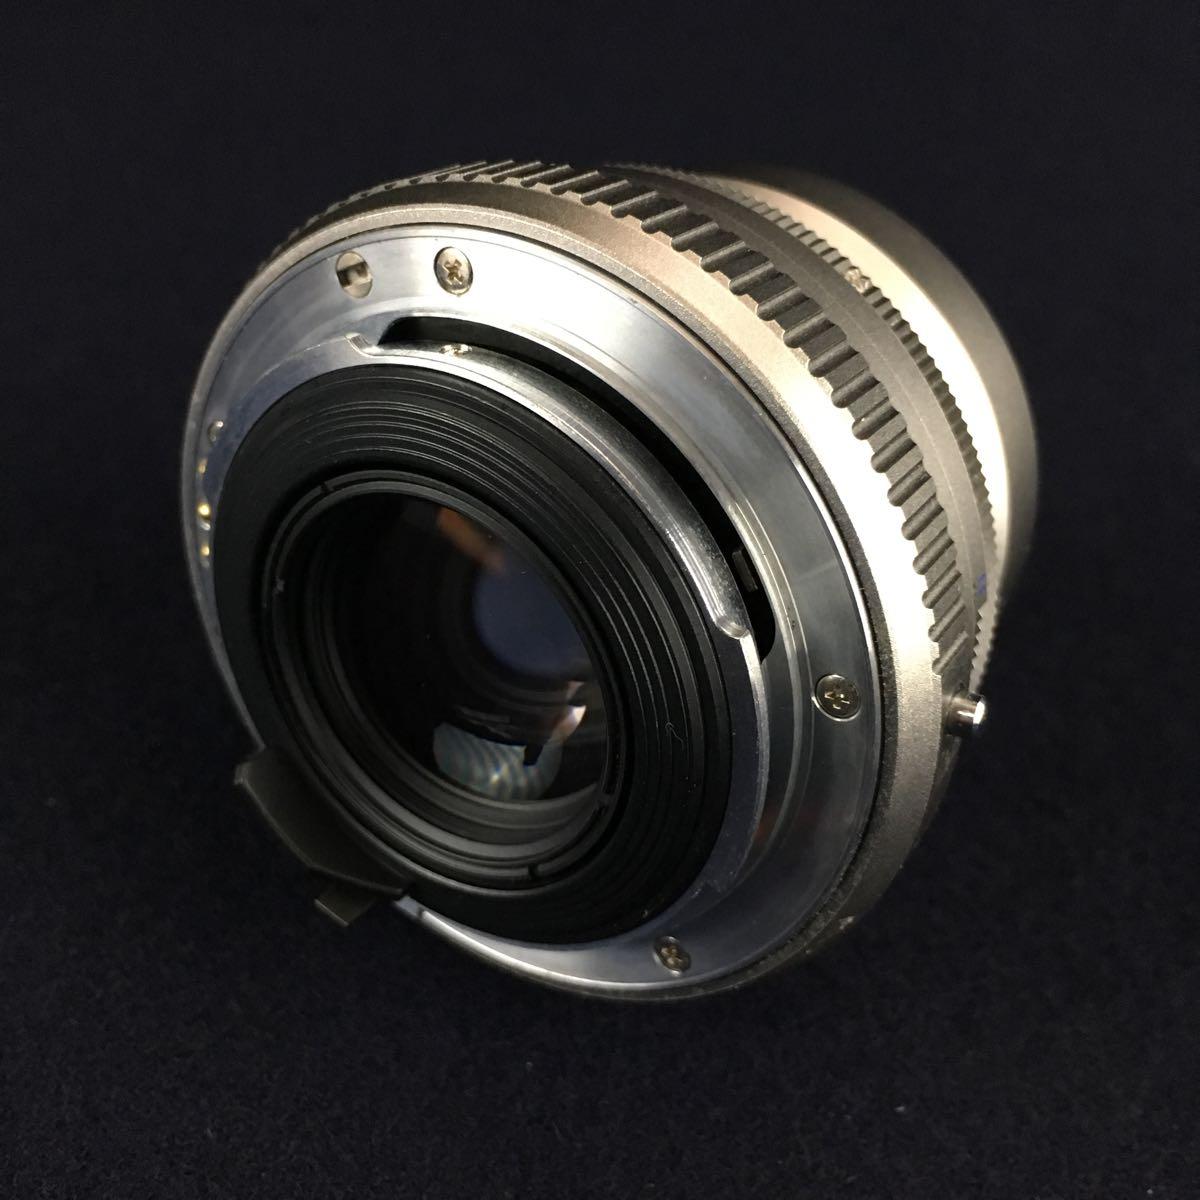 PENTAX-FA 43mm 1.9 Limited / FA 28-200mm 3.8-5.6 オートフォーカスレンズ2点_画像6